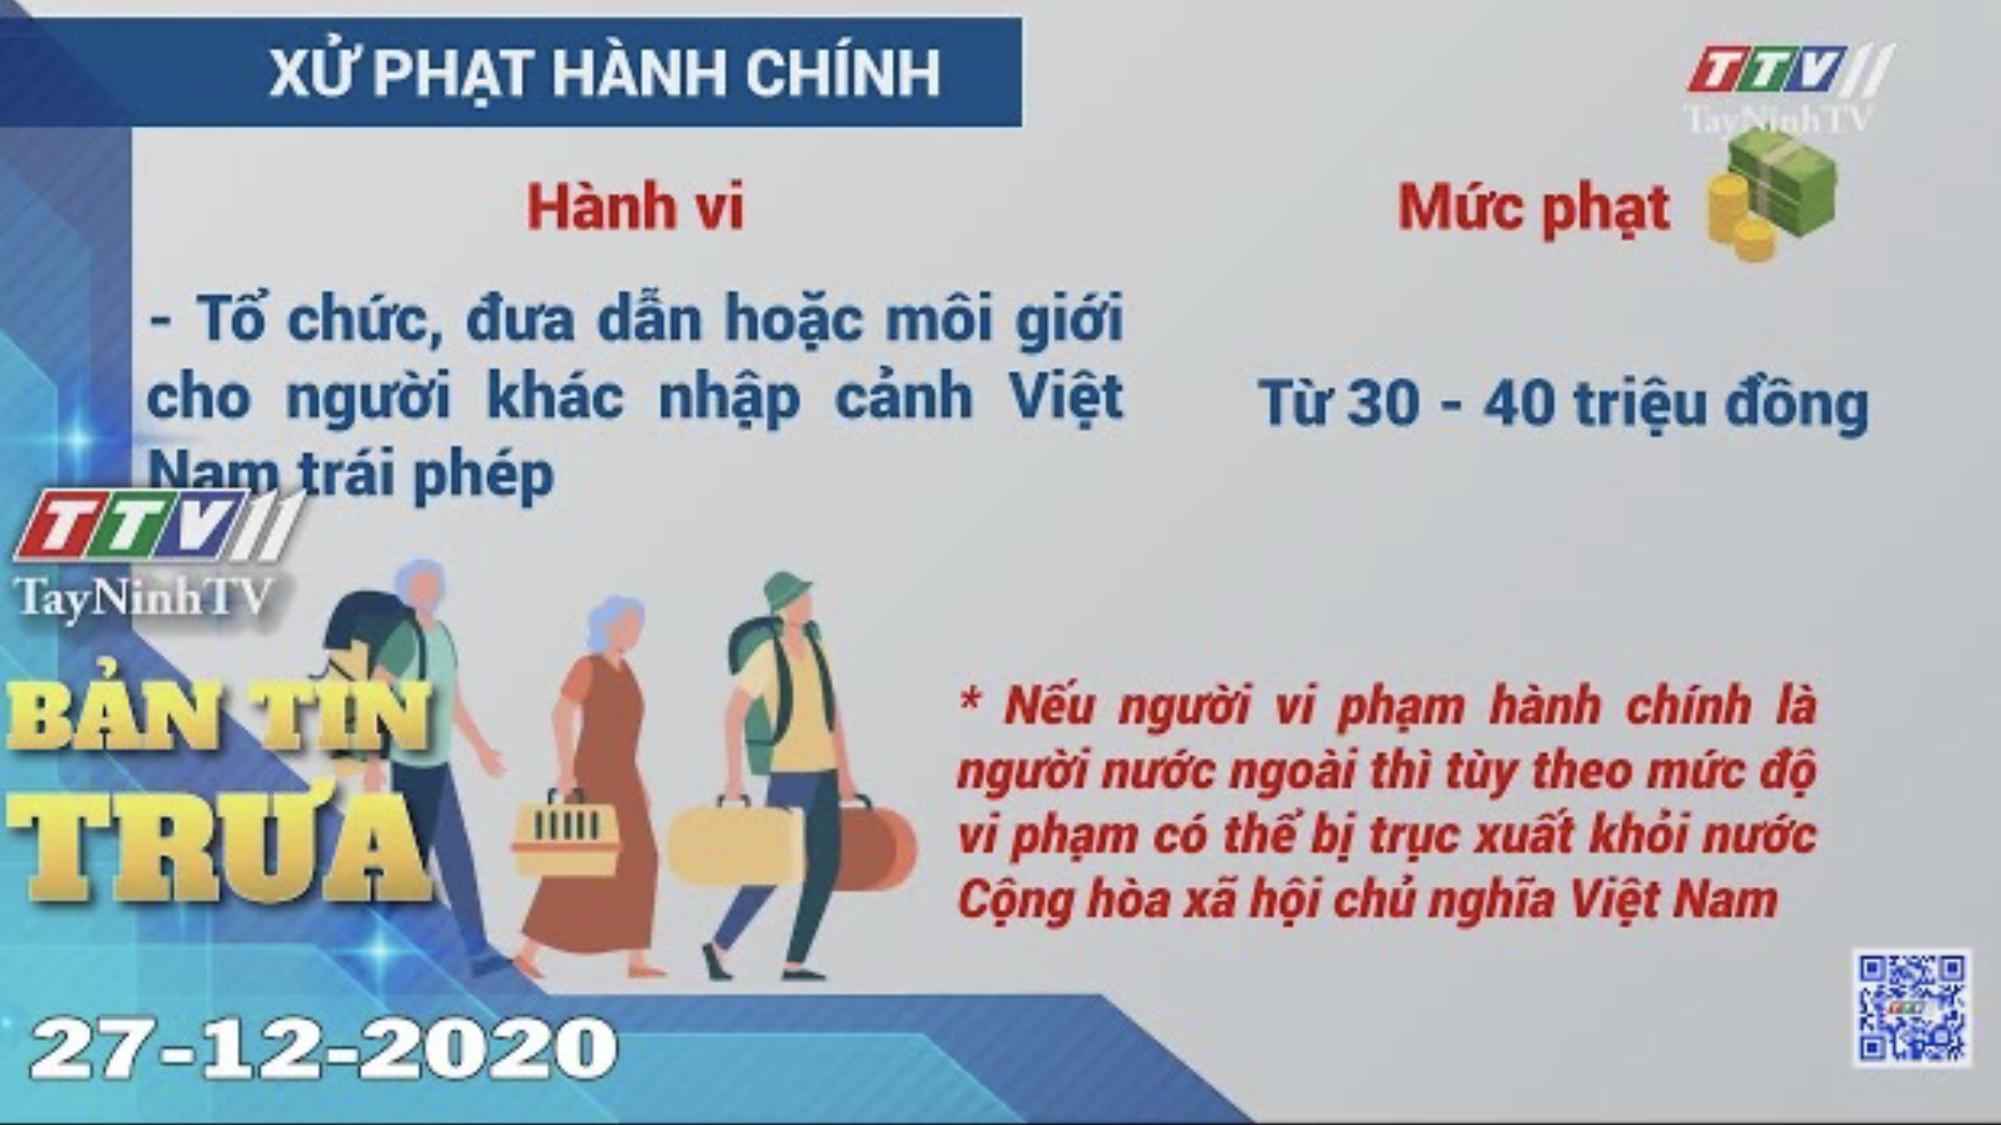 Bản tin trưa 27-12-2020 | Tin tức hôm nay | TayNinhTV